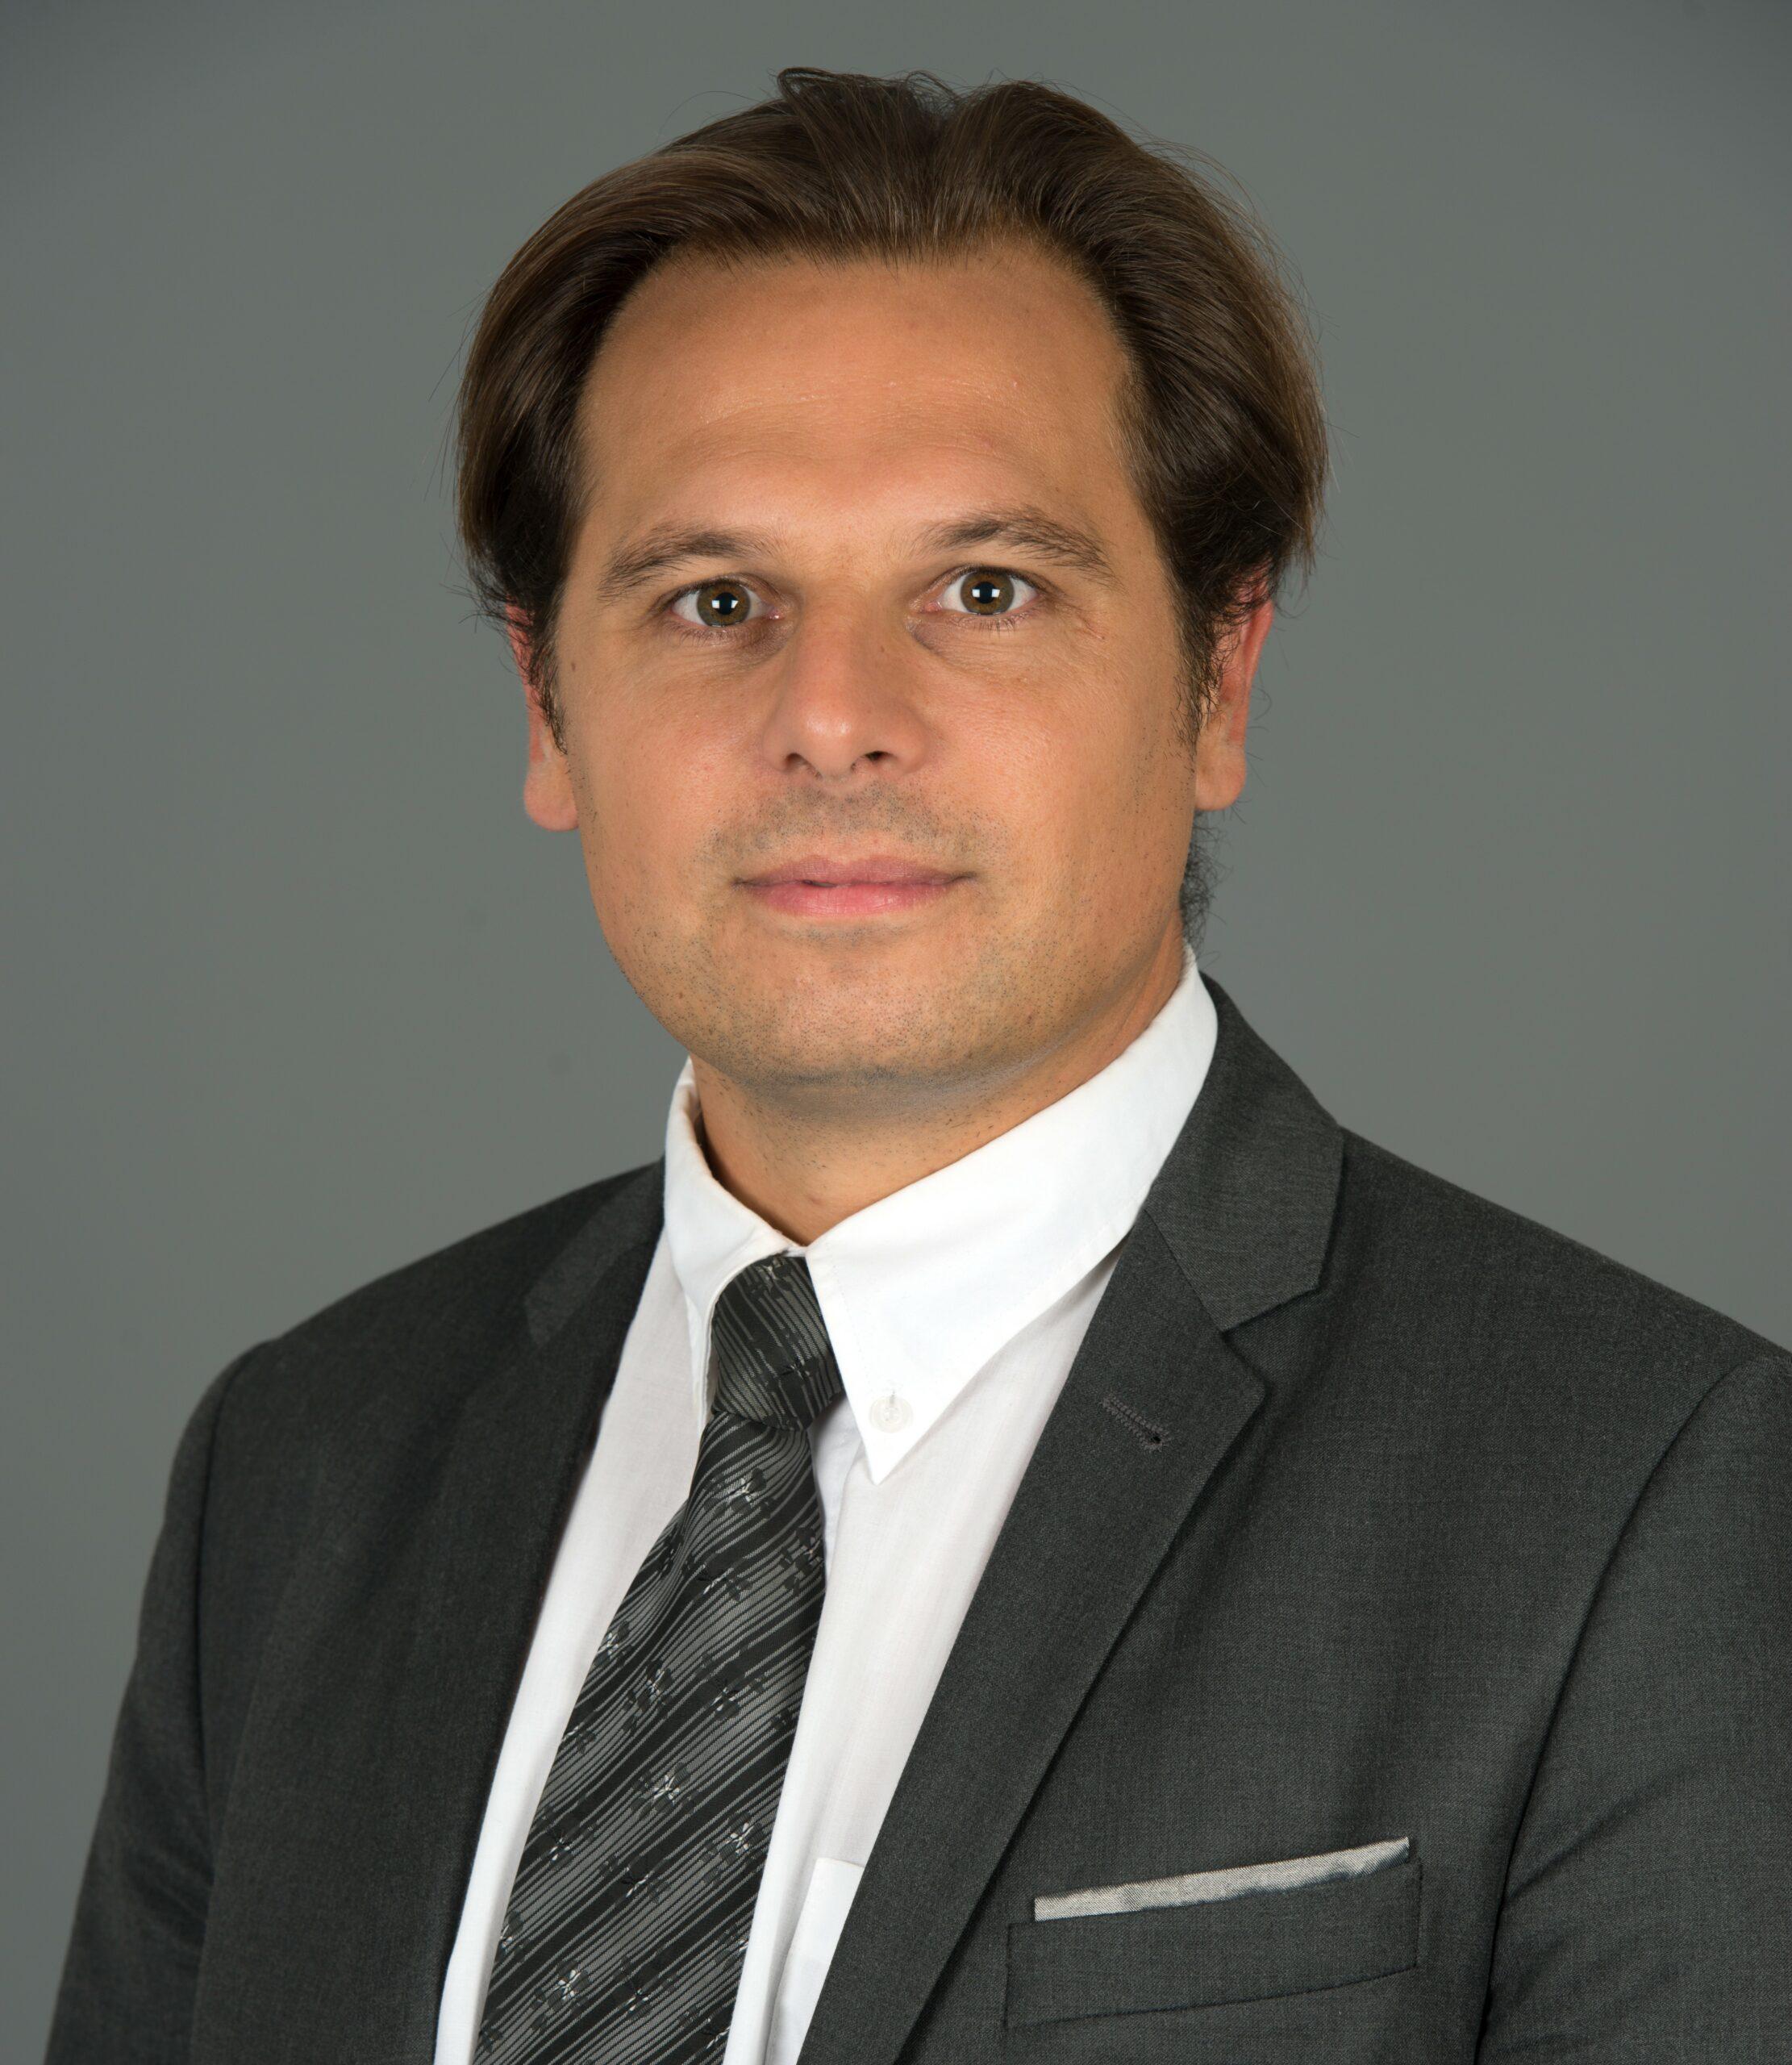 Michael Maras Arthur Loyd